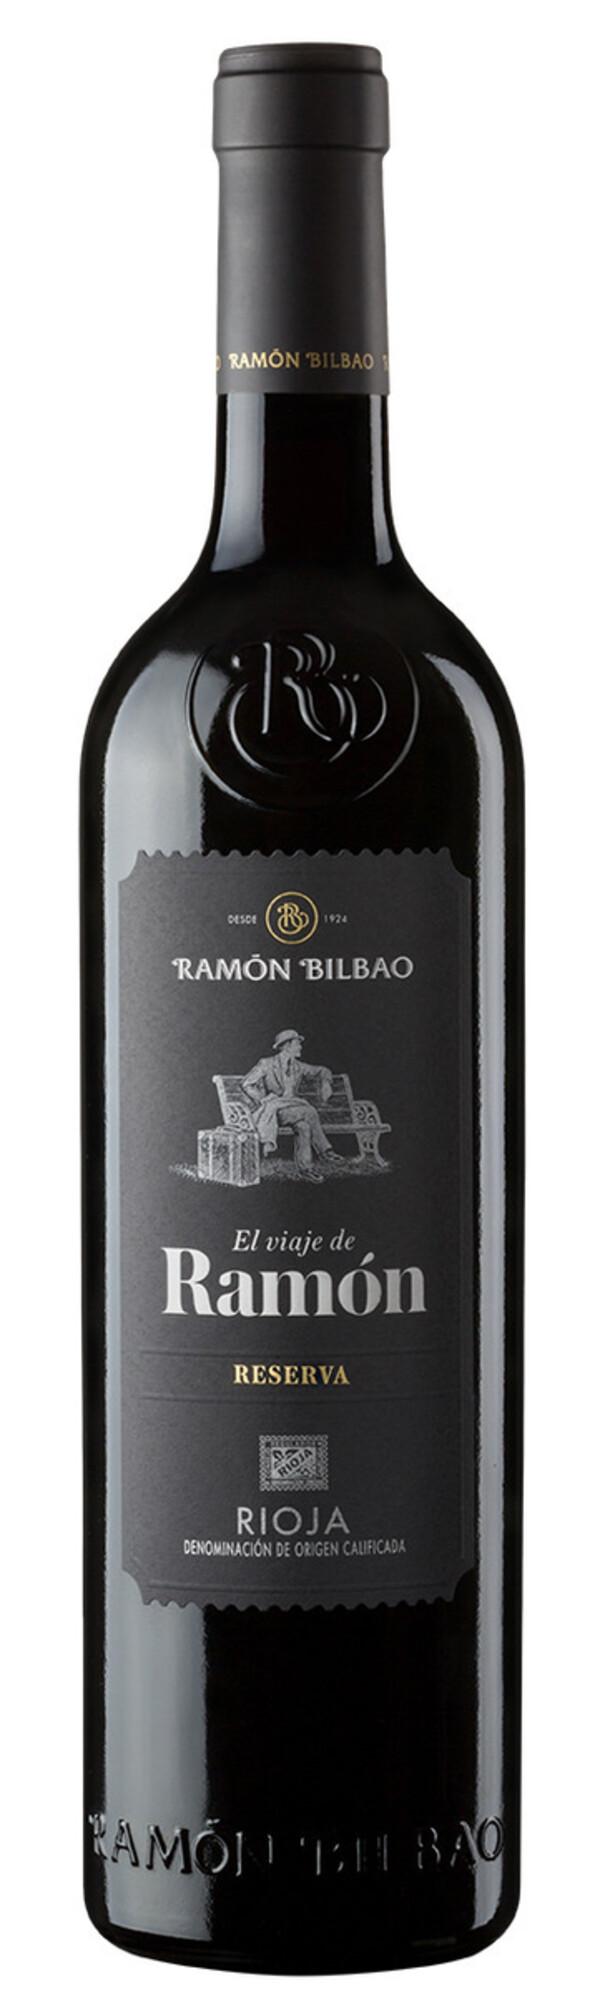 Ramon Bilbao El Viaje de Ramón Reserva 2015 0,75 ltr